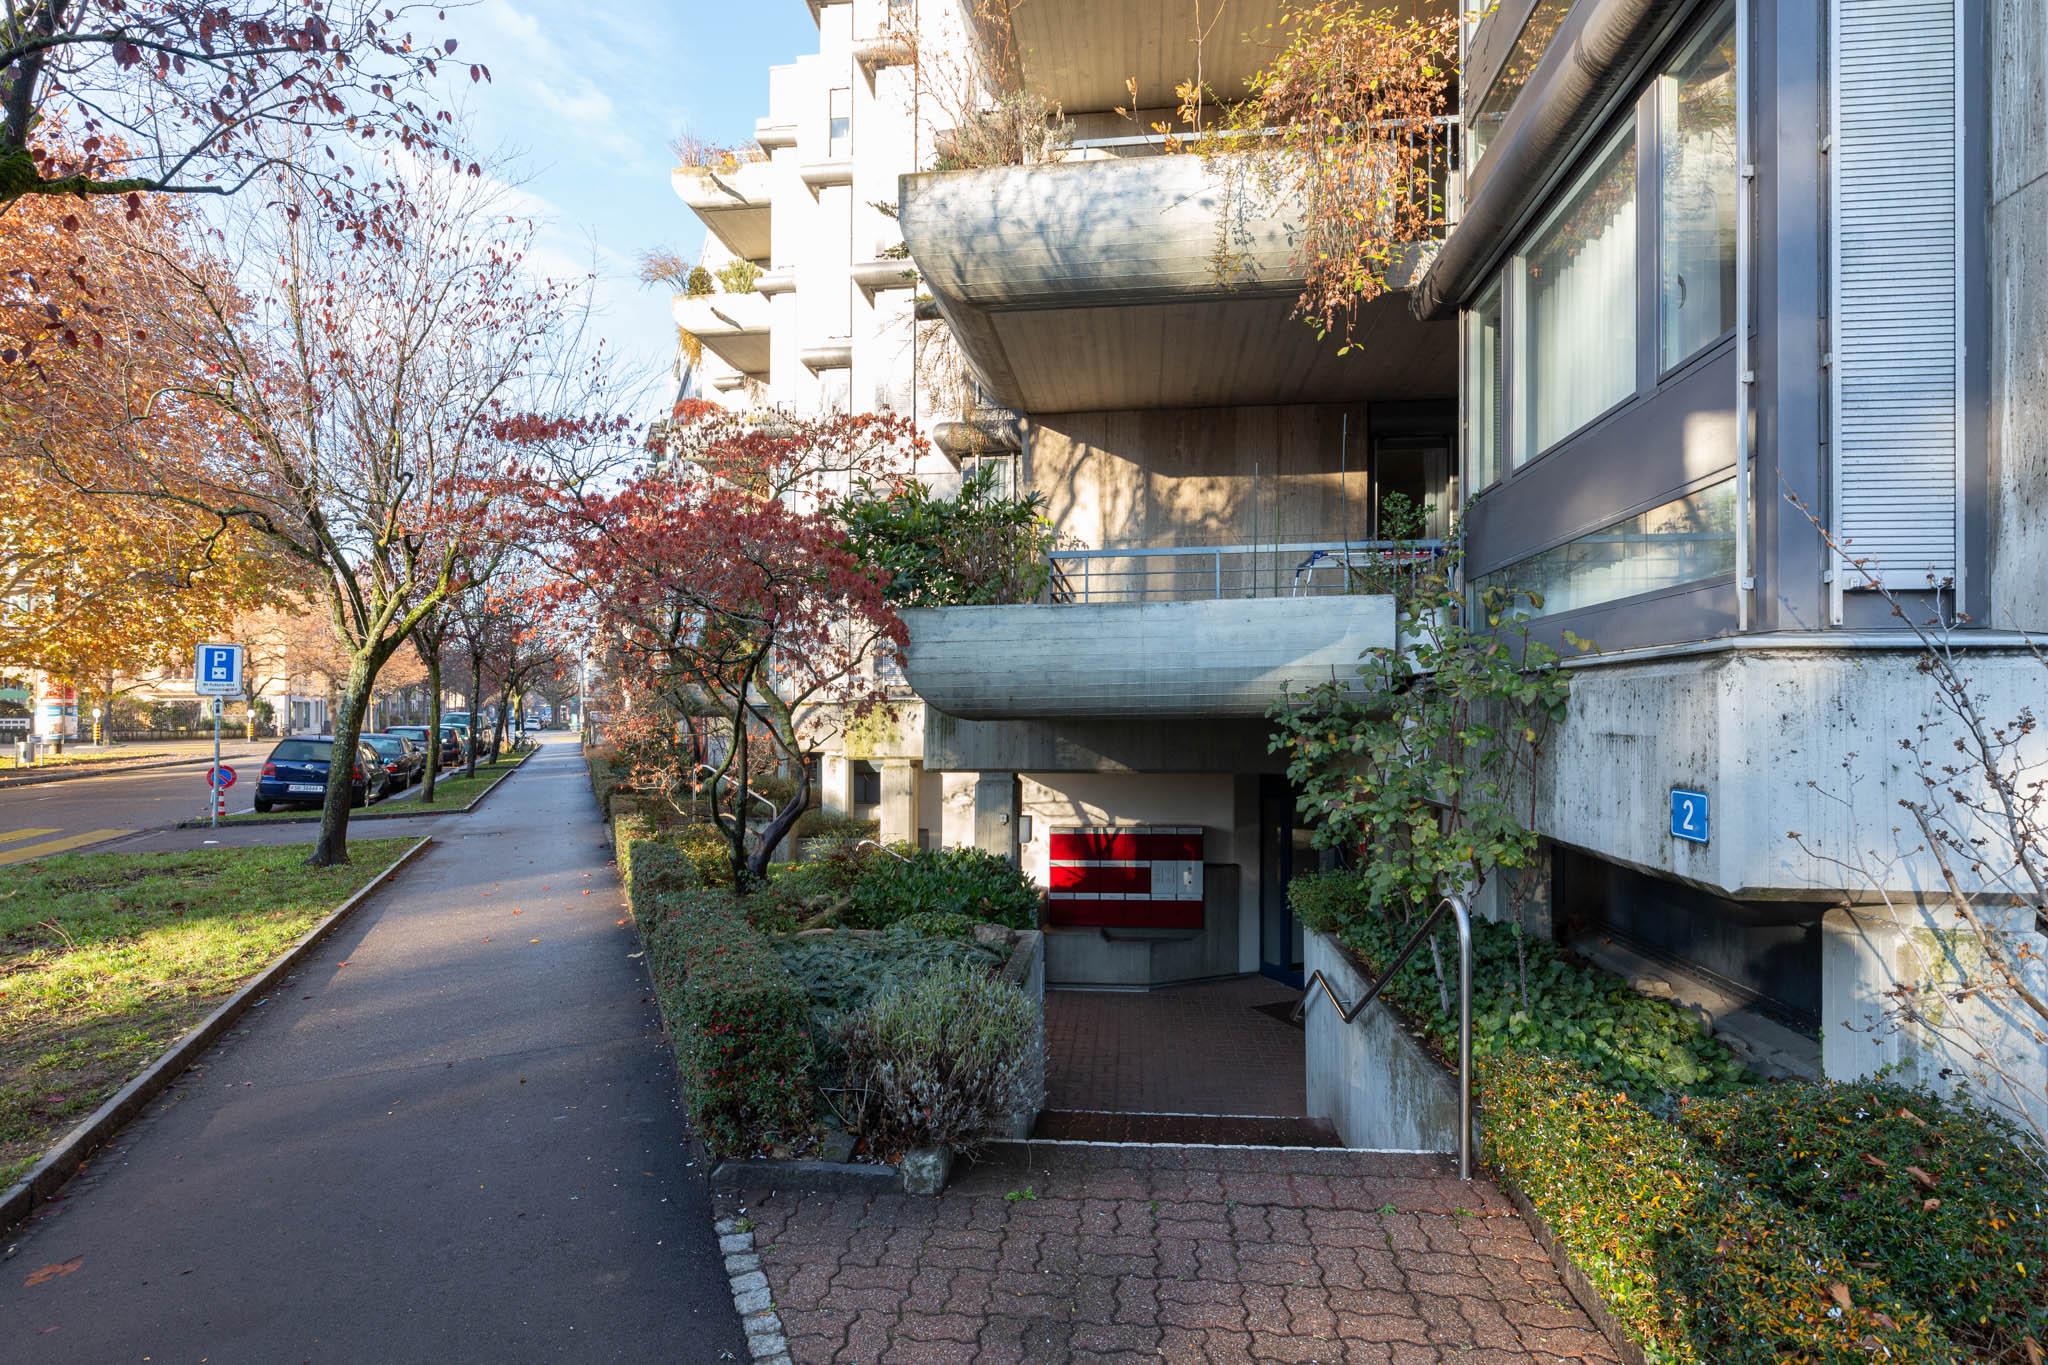 Wohnhaus Wielandplatz © Burckhardt+Partner